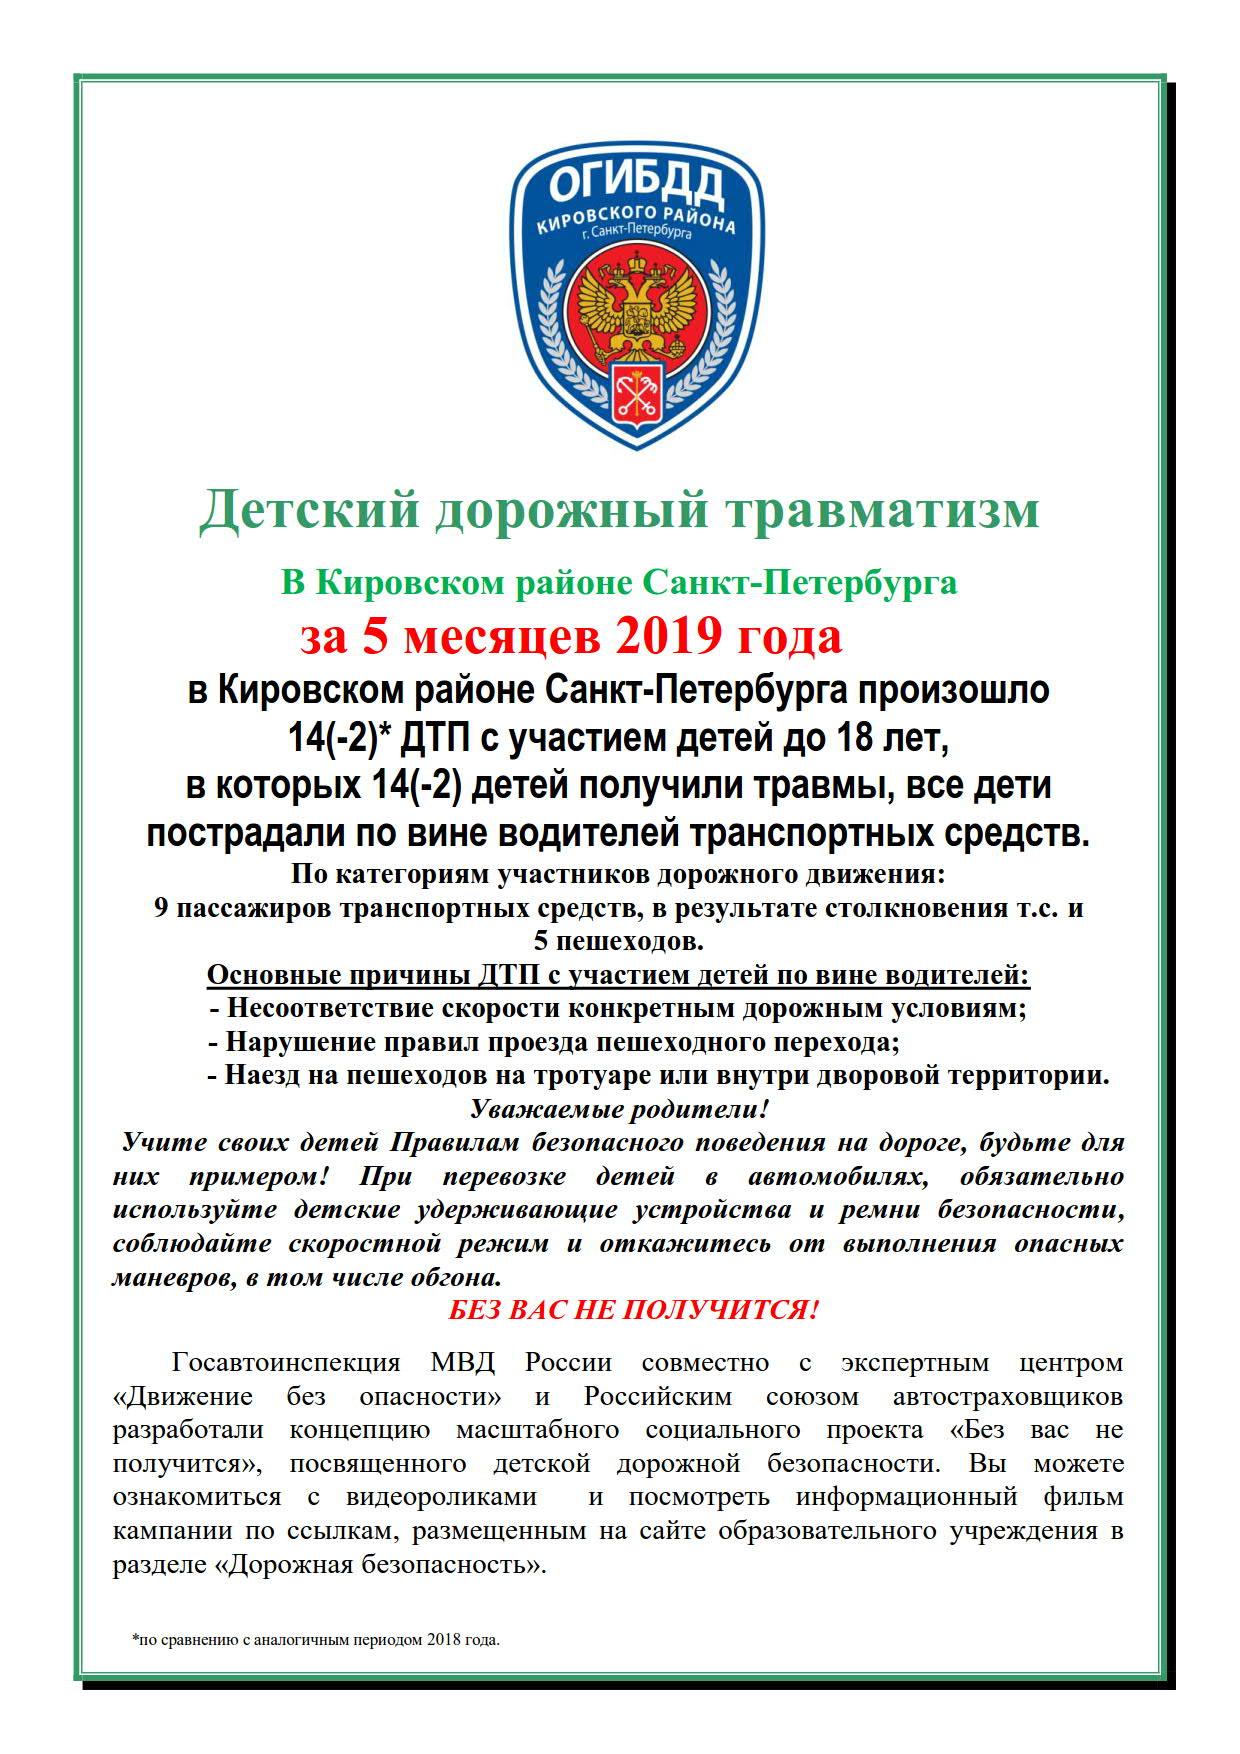 листовка ДДТТ 5 мес 2019_1